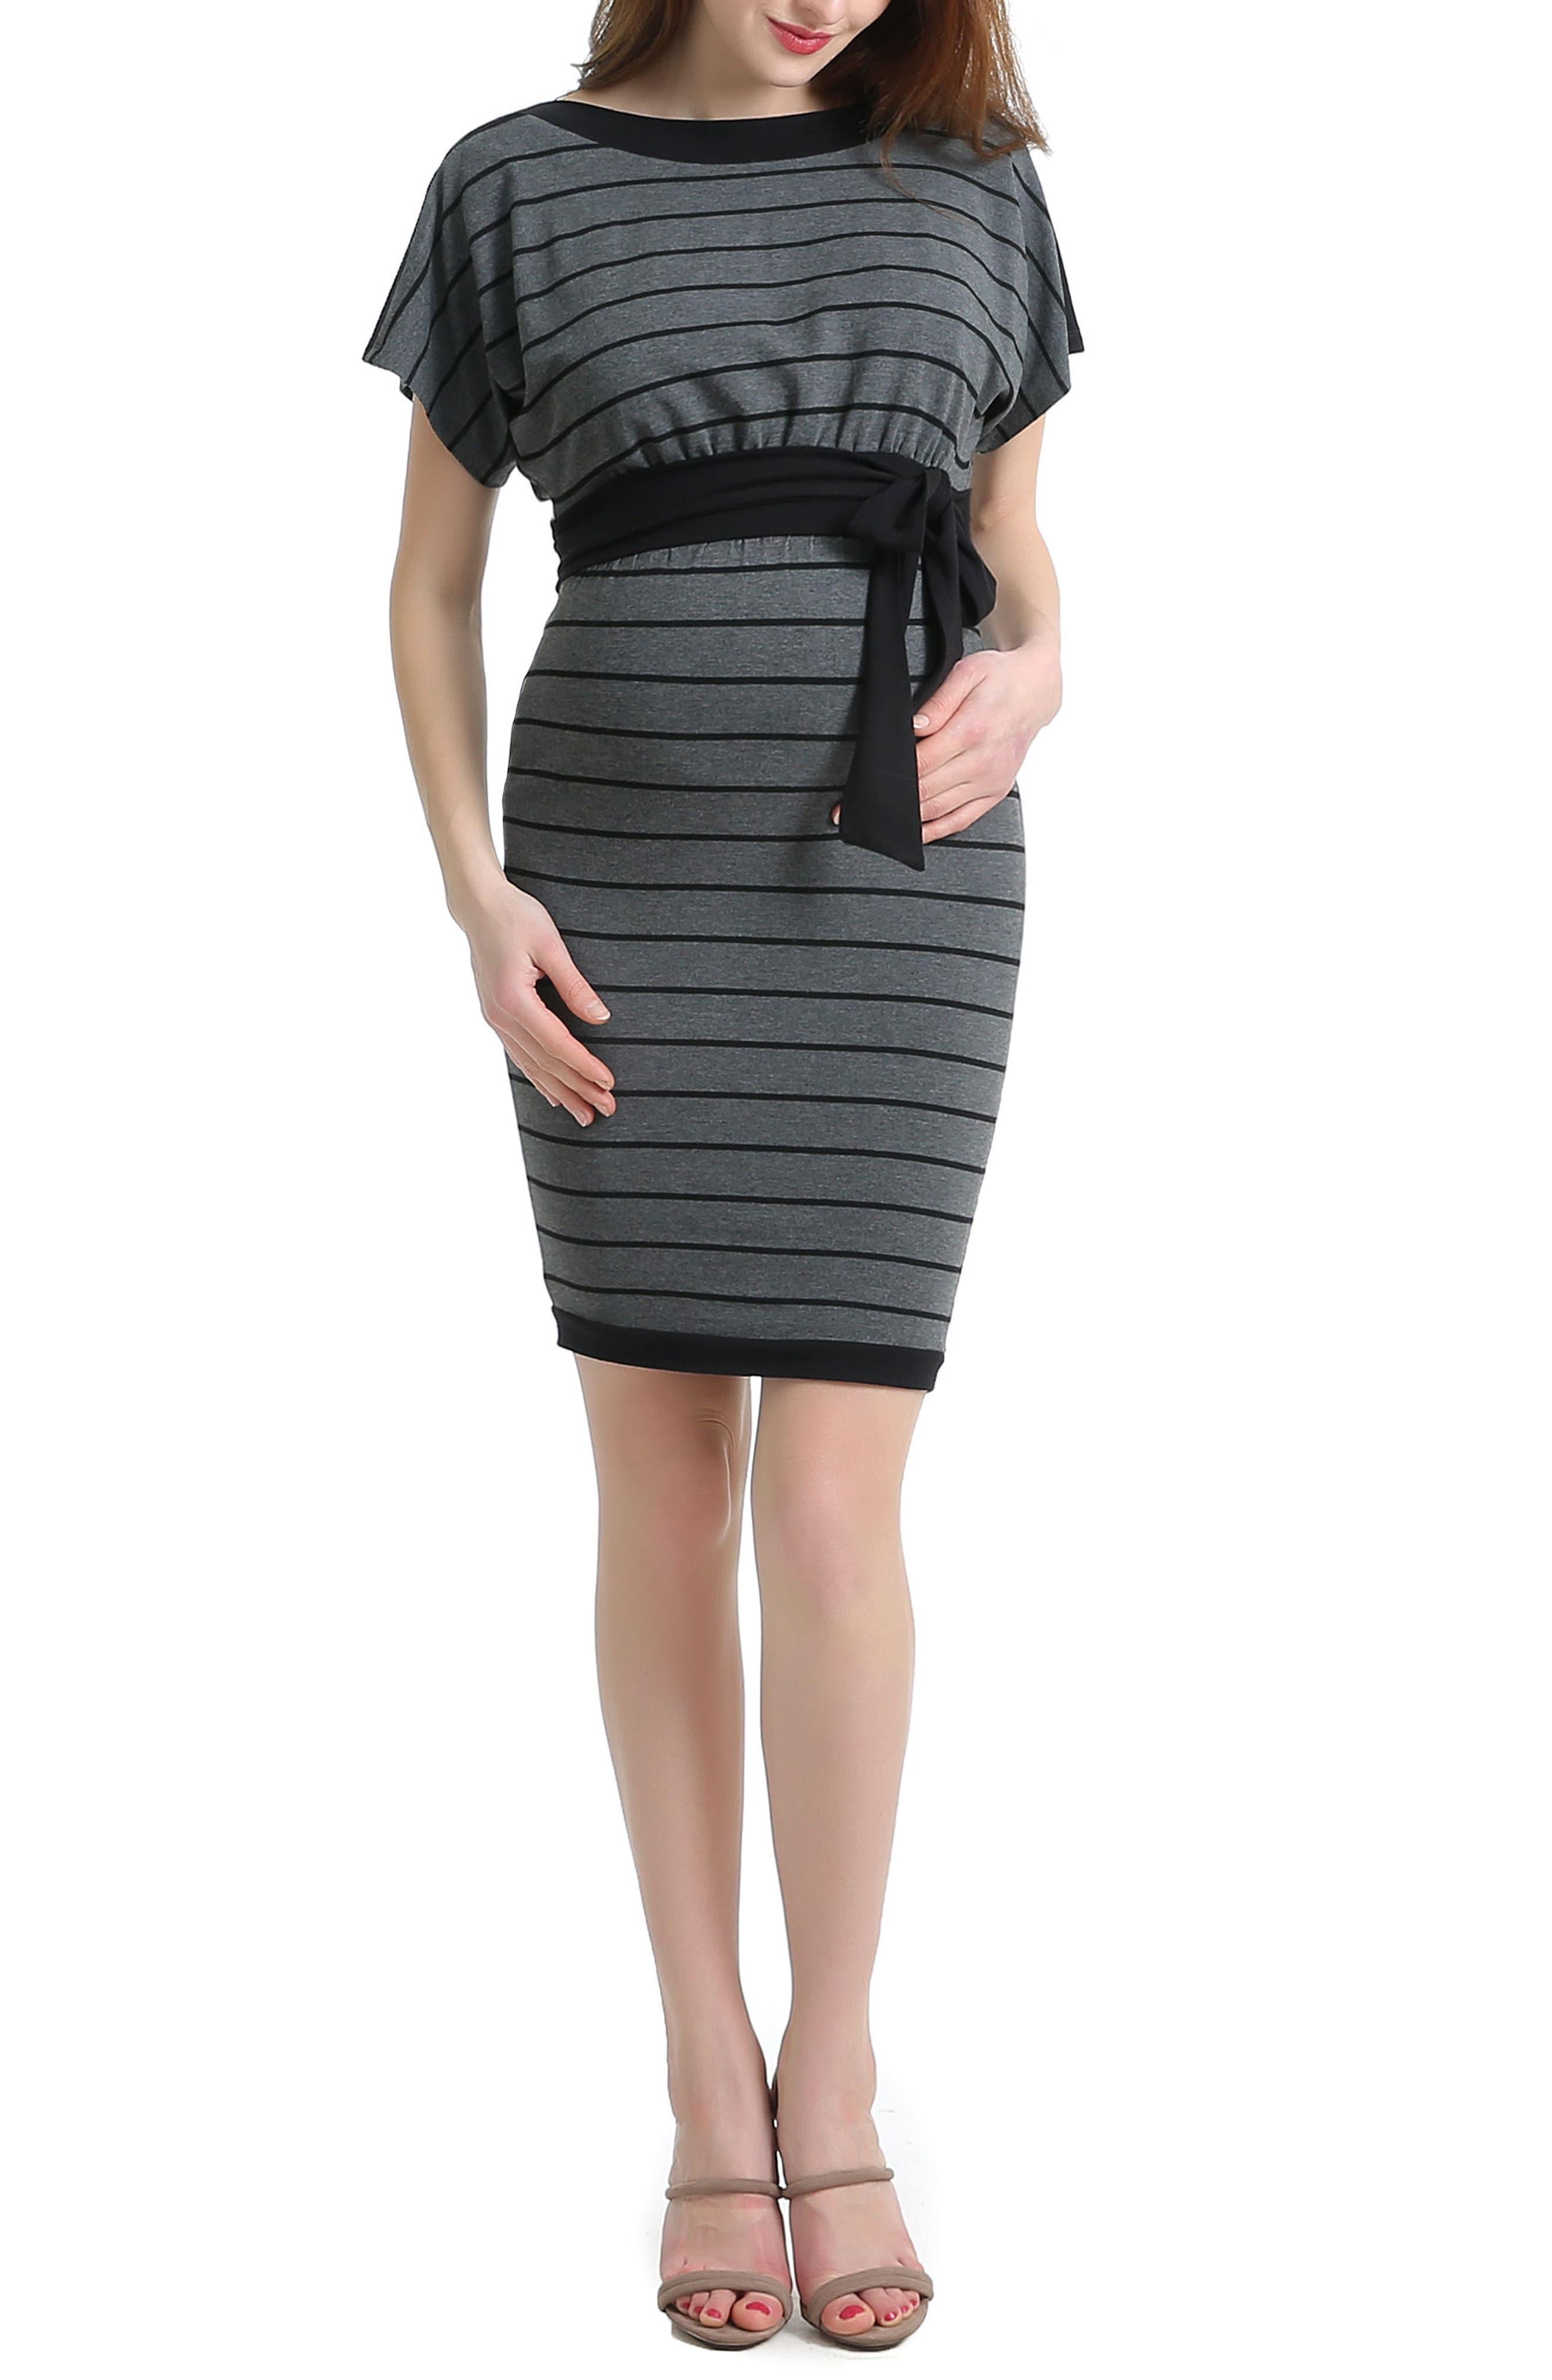 Anna Stretch Maternity Dress,                             Main thumbnail 1, color,                             Black/ Gray